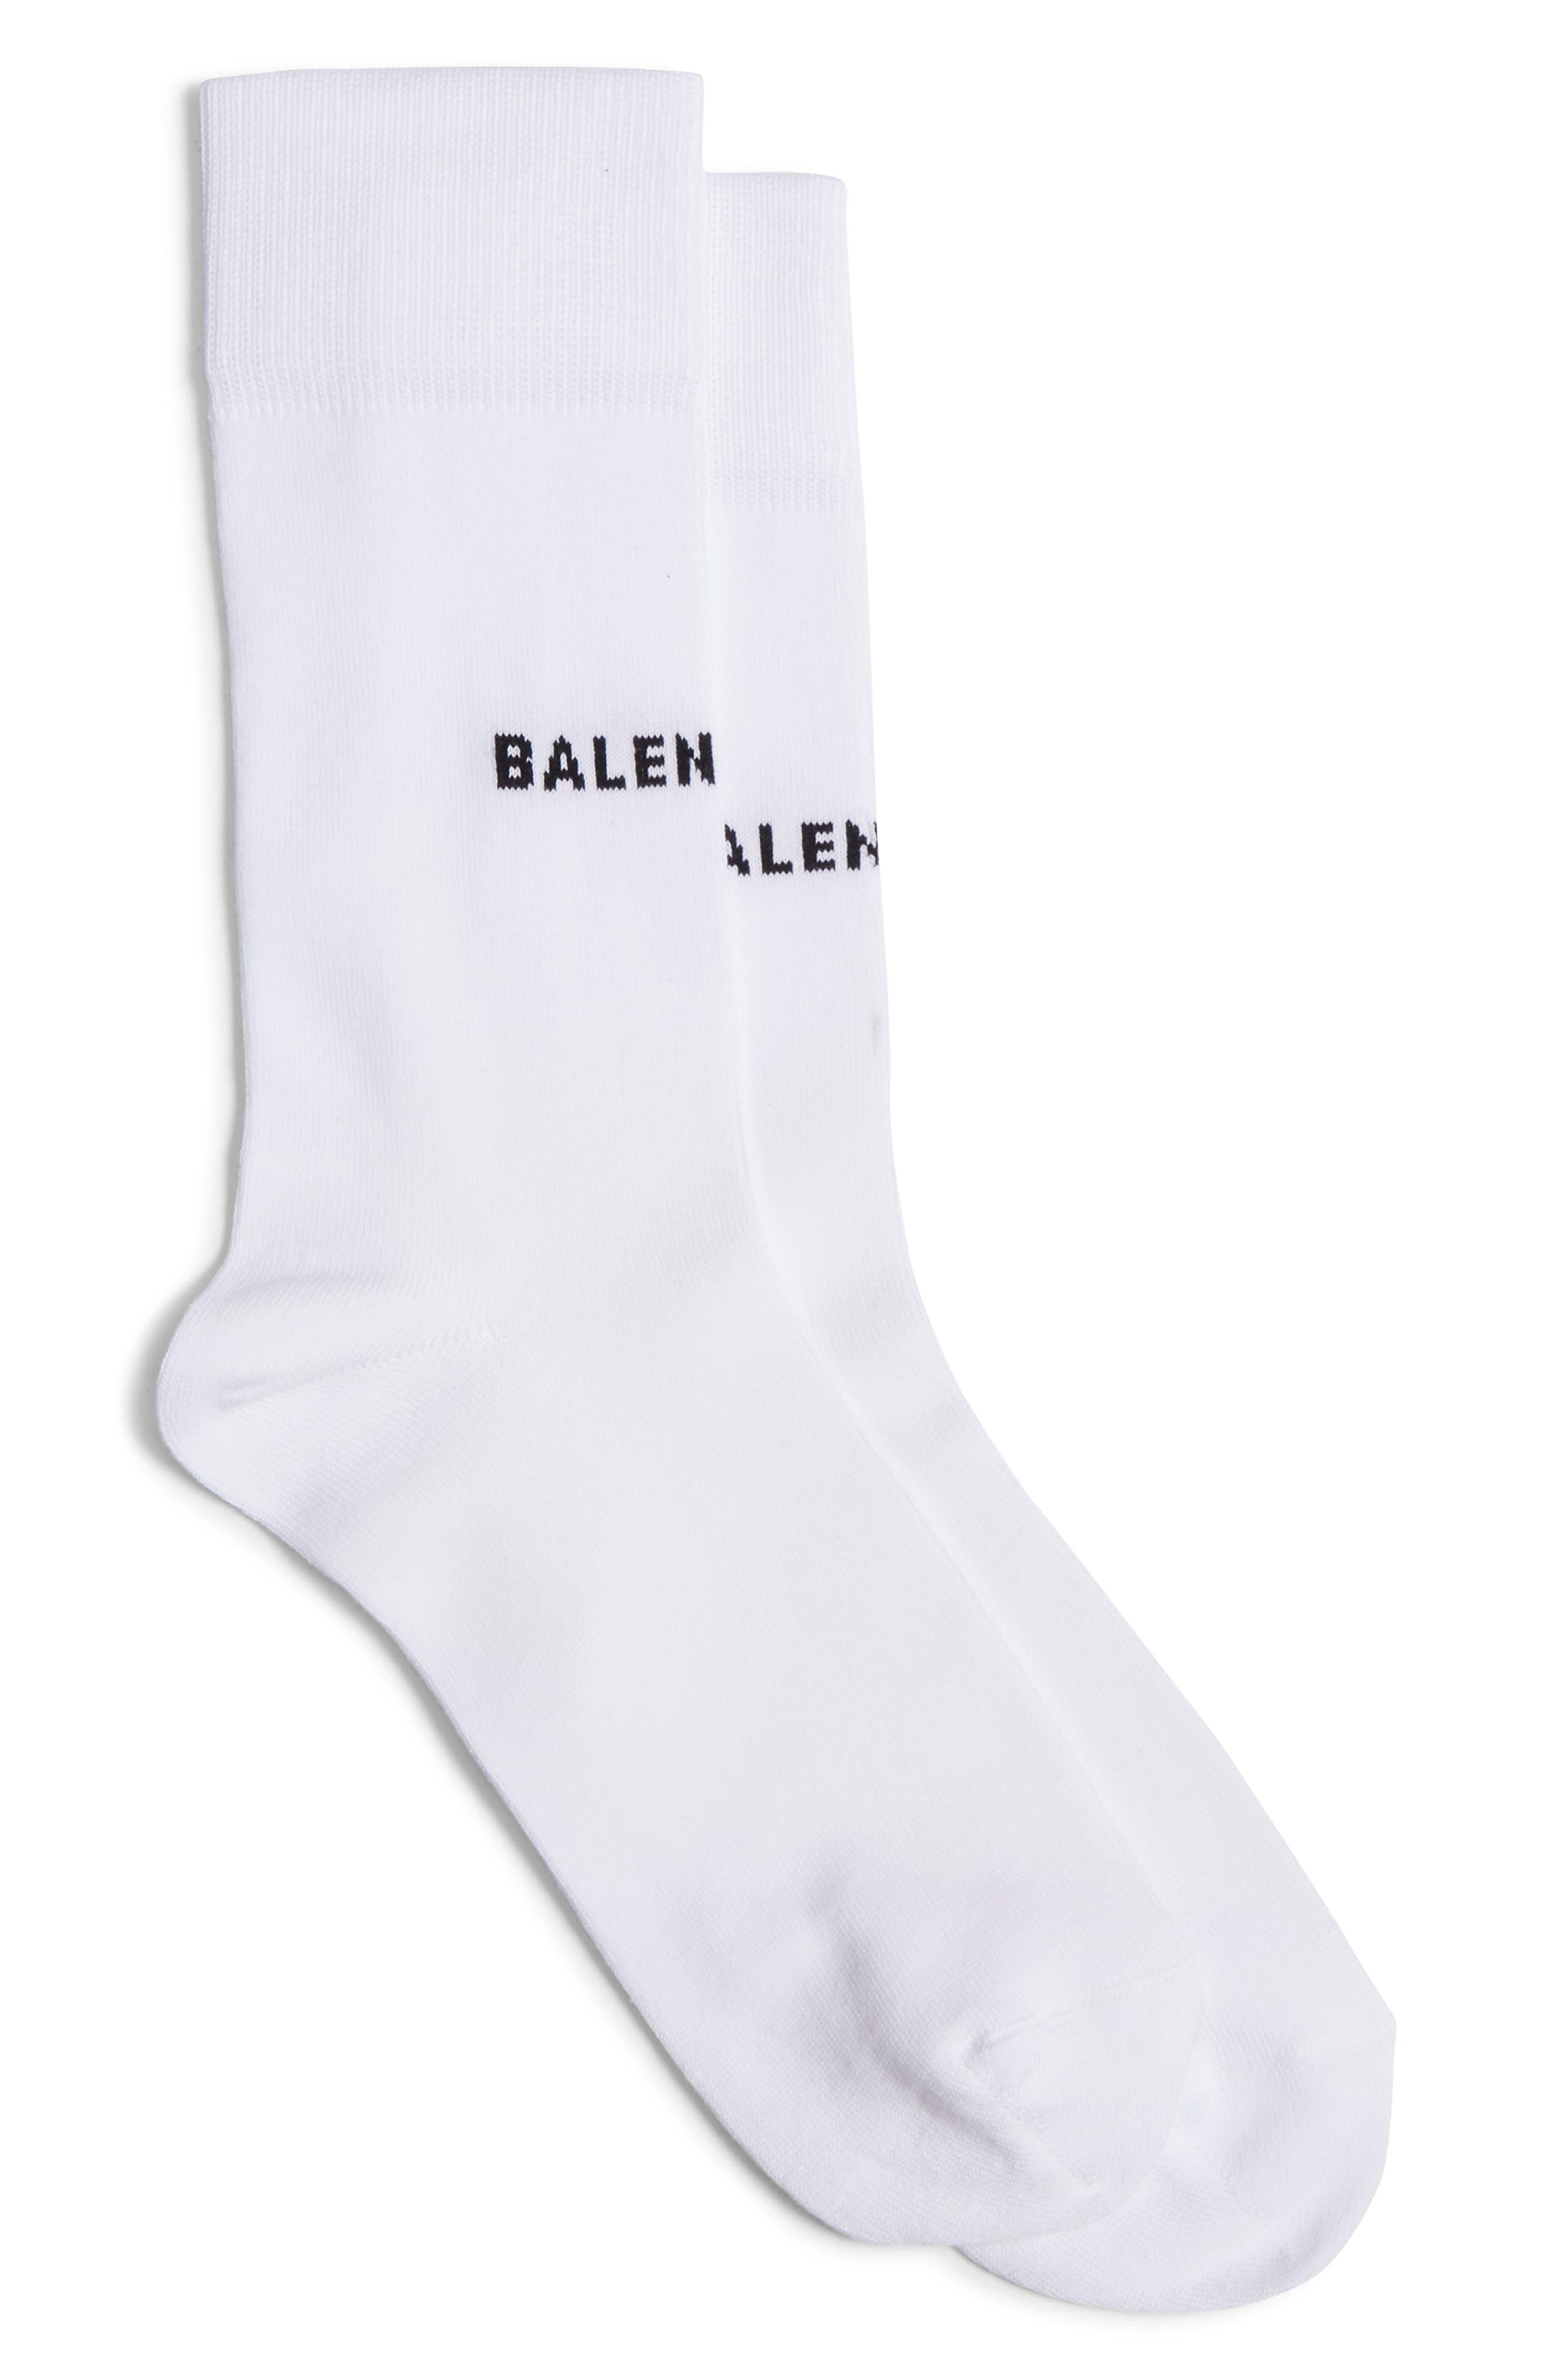 BALENICAGA LOGO CREW SOCKS